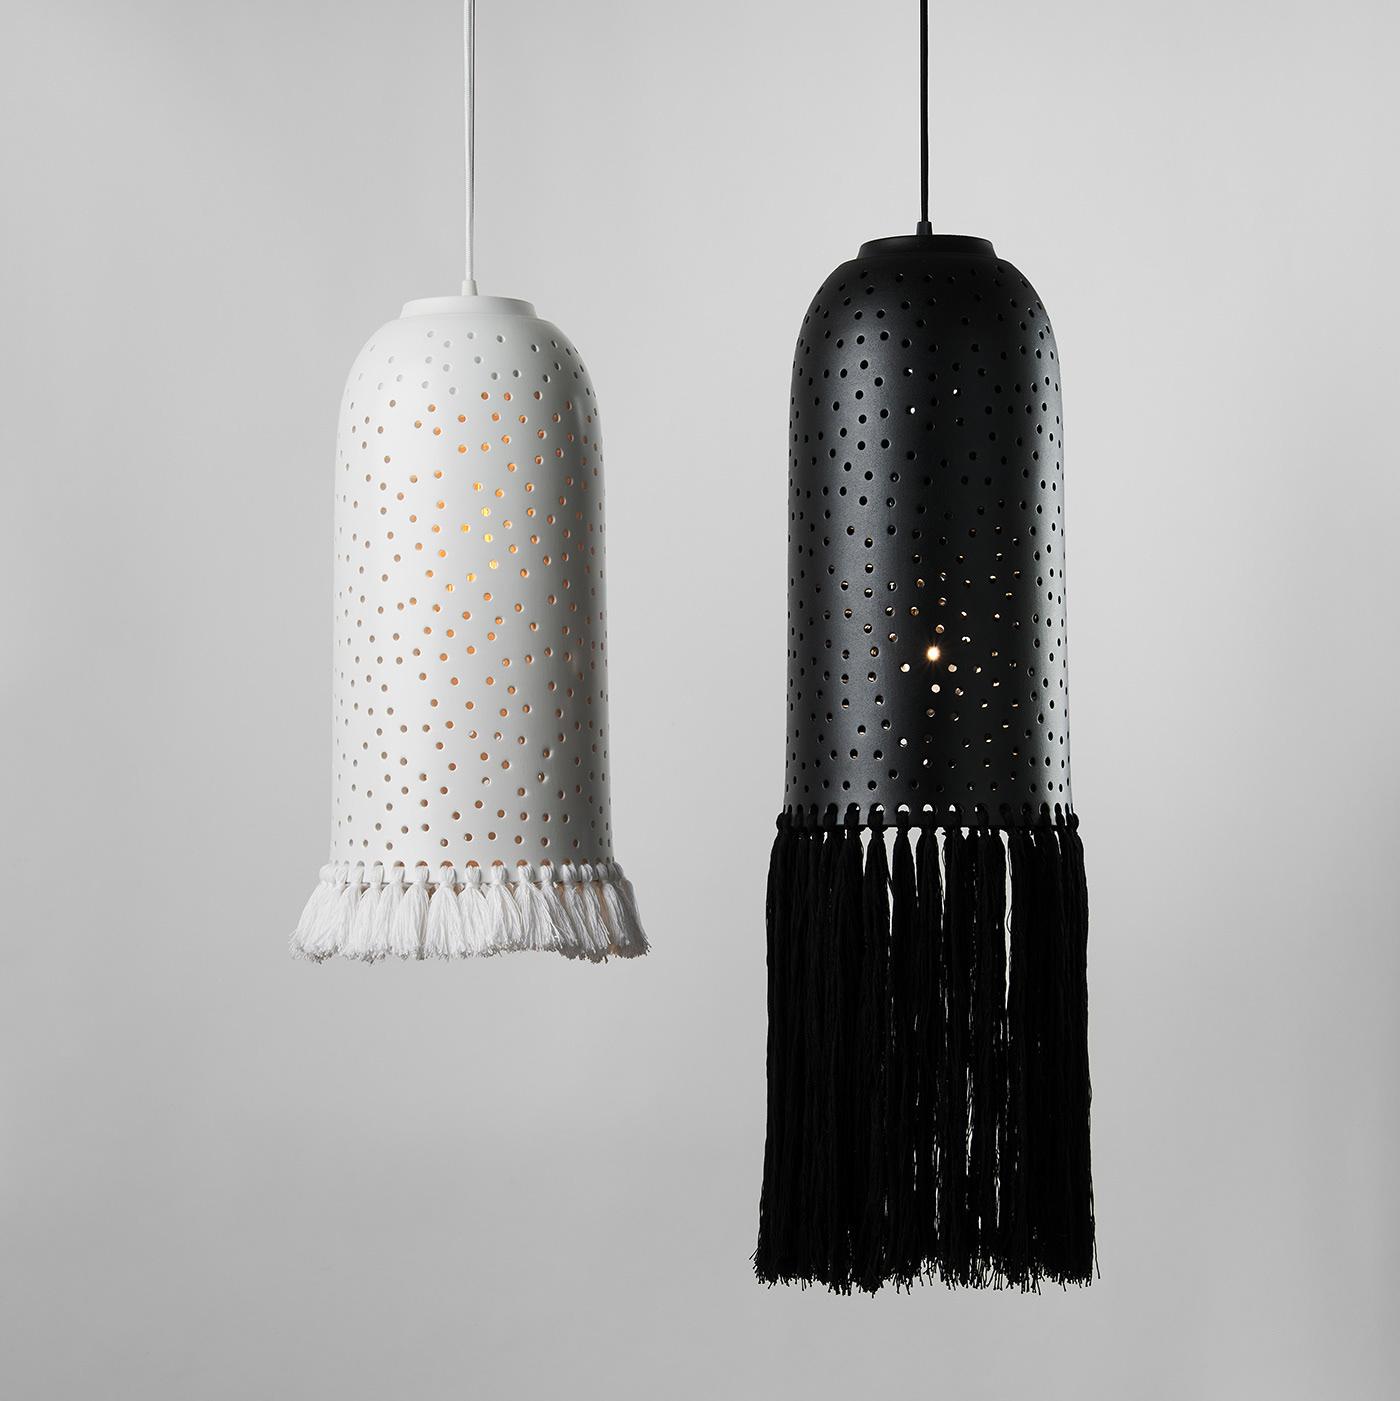 ceramics  ceramics lamp design hygge hygge style KononenkoID Lamp light lighting pendant lamp